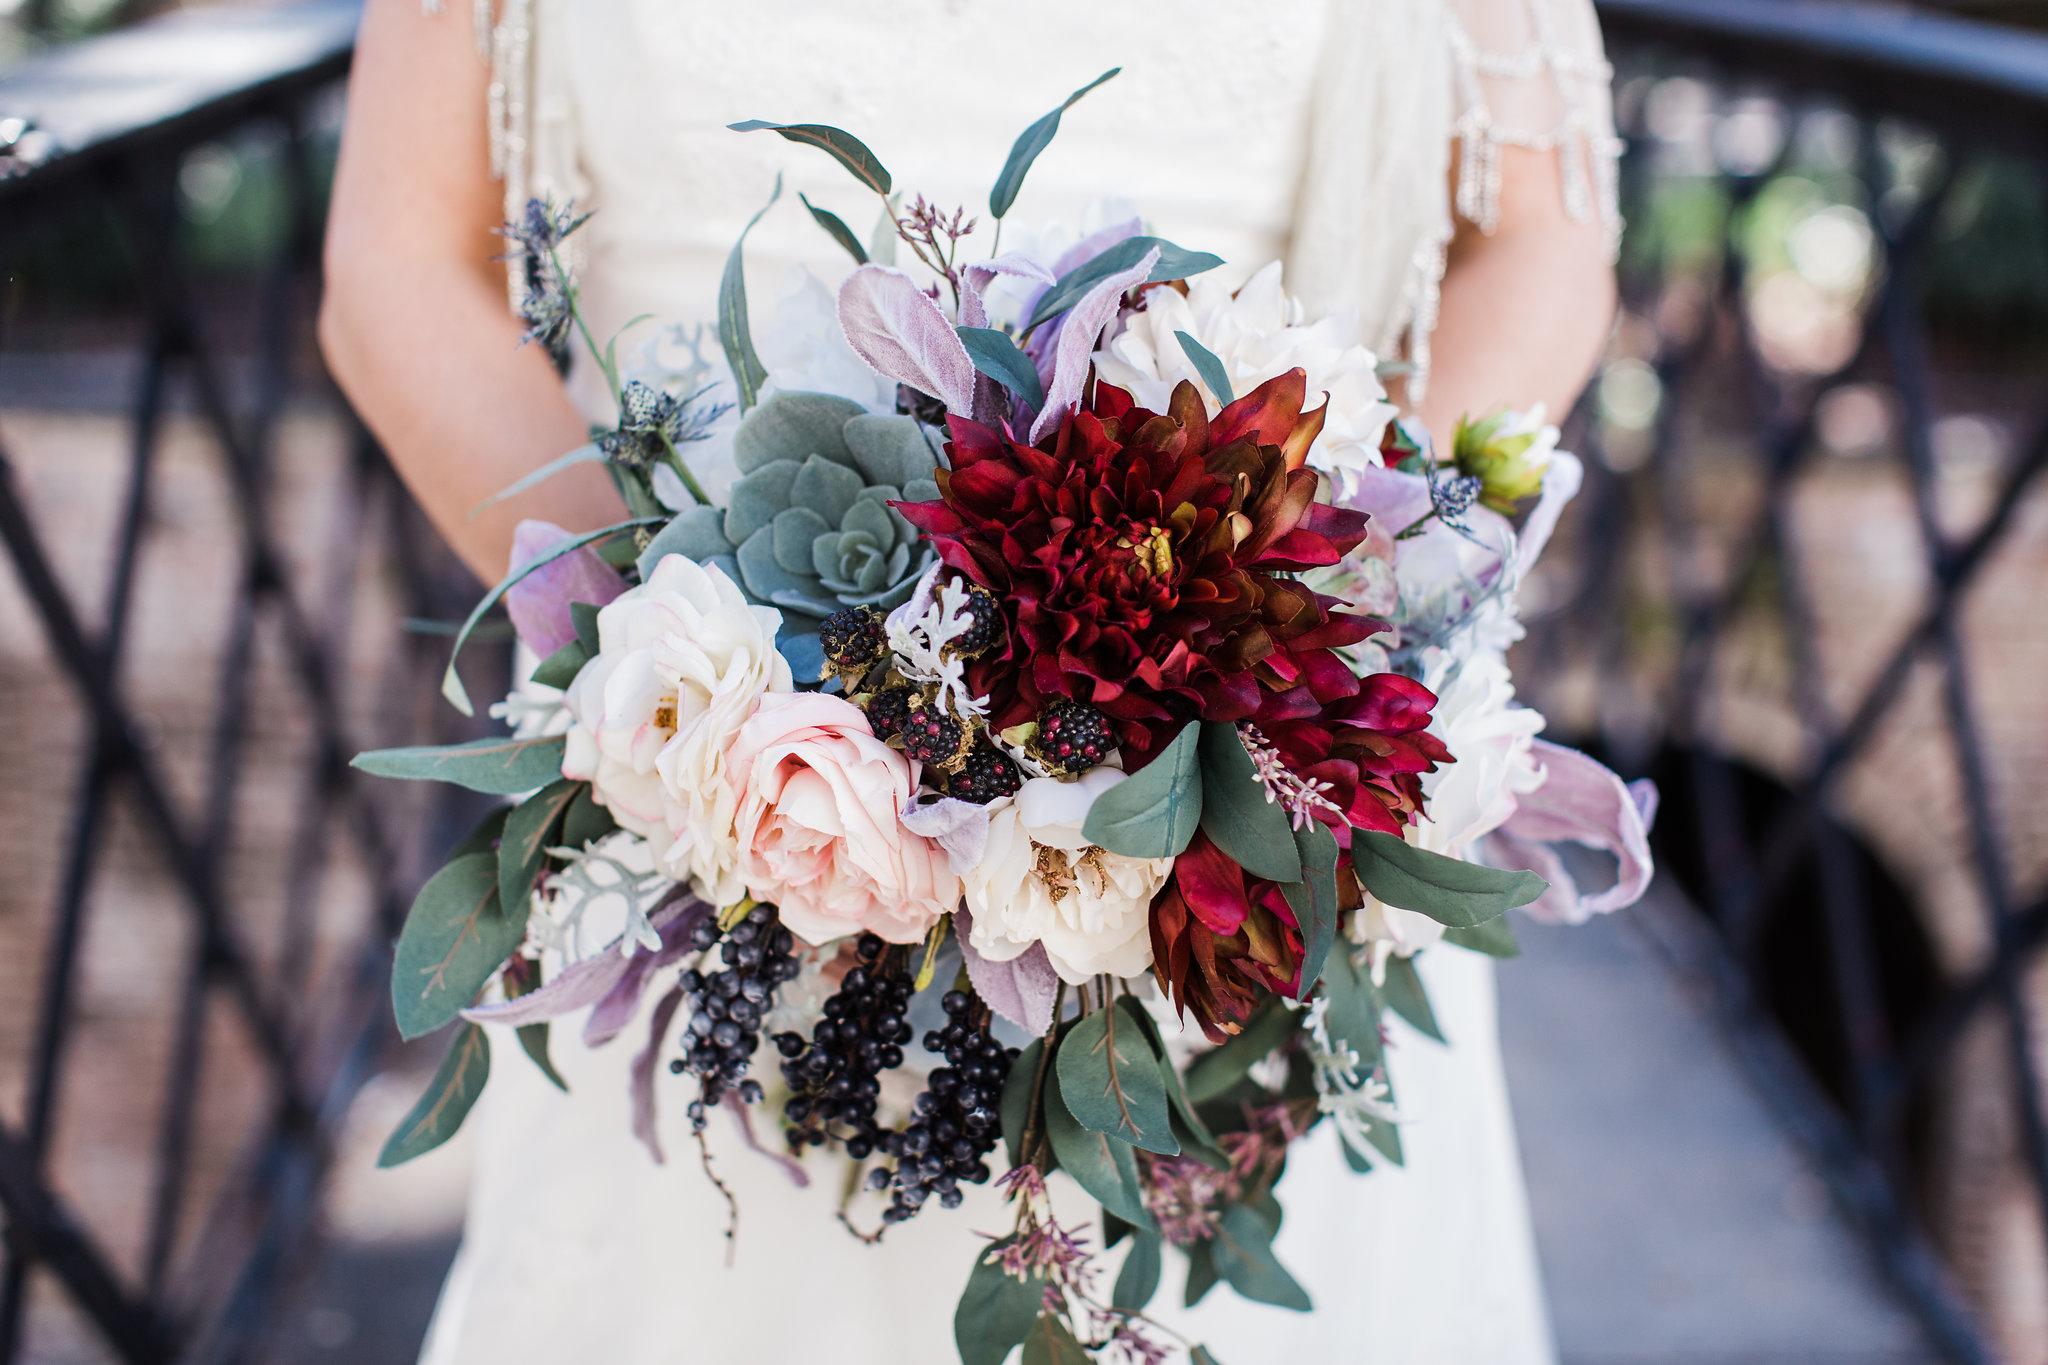 apt-b-photography-kristy-rob-wormsloe-elopment-savannah-wedding-photographer-savannah-elopement-wormsloe-wedding-historic-savannah-bouquet-12.jpg